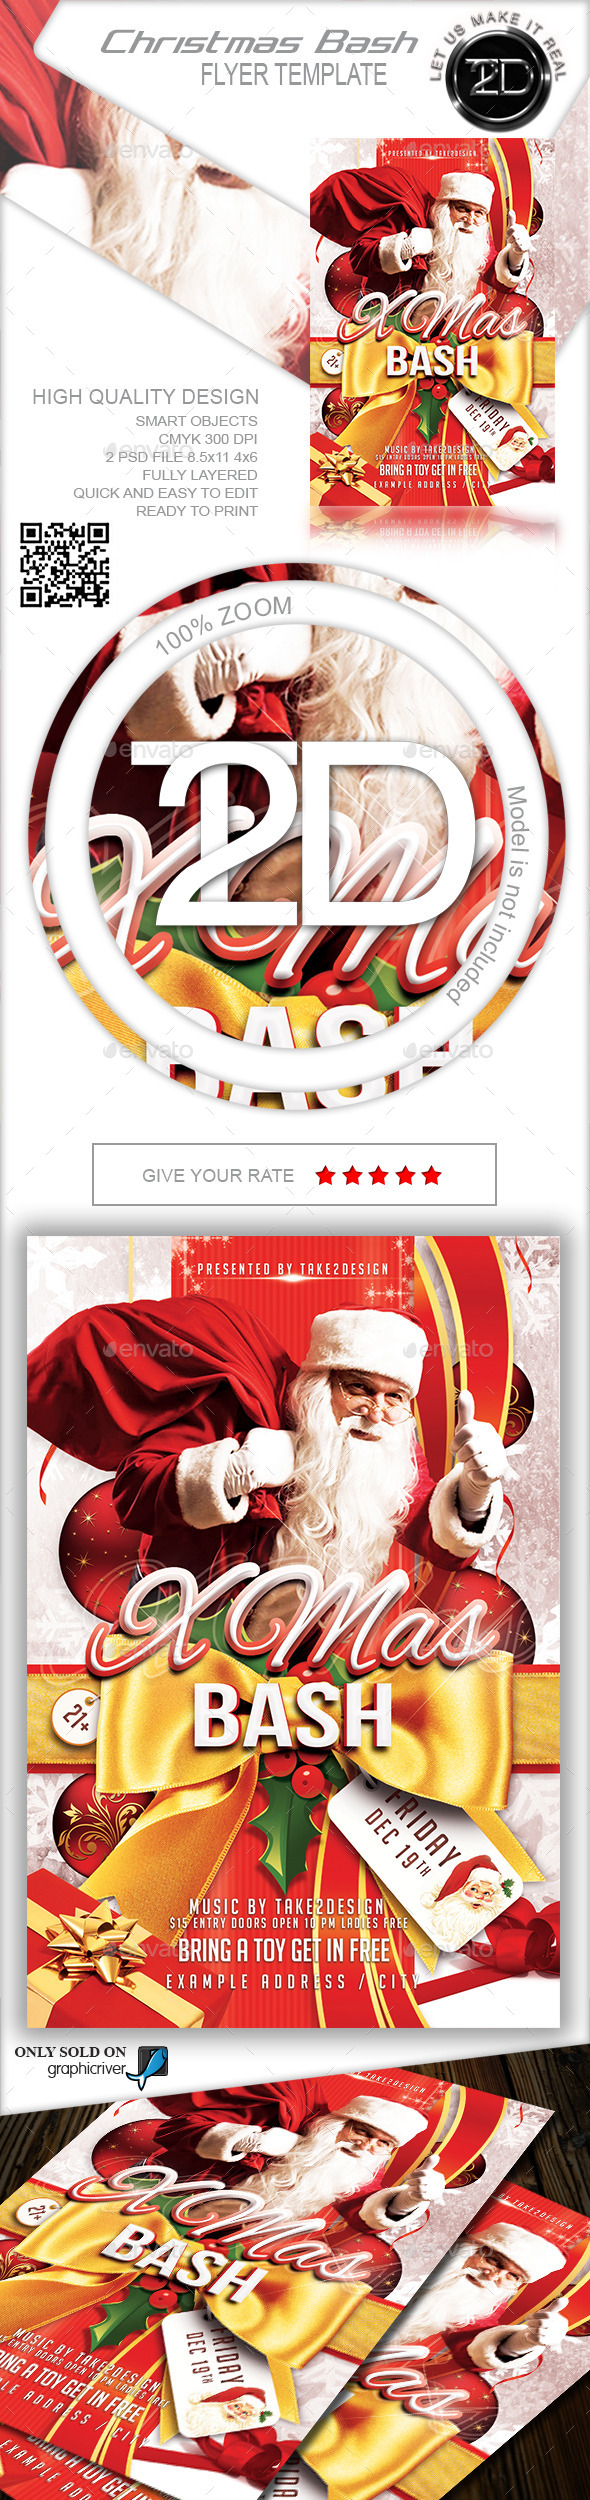 GraphicRiver Christmas Party-Xmas Bash 9343199